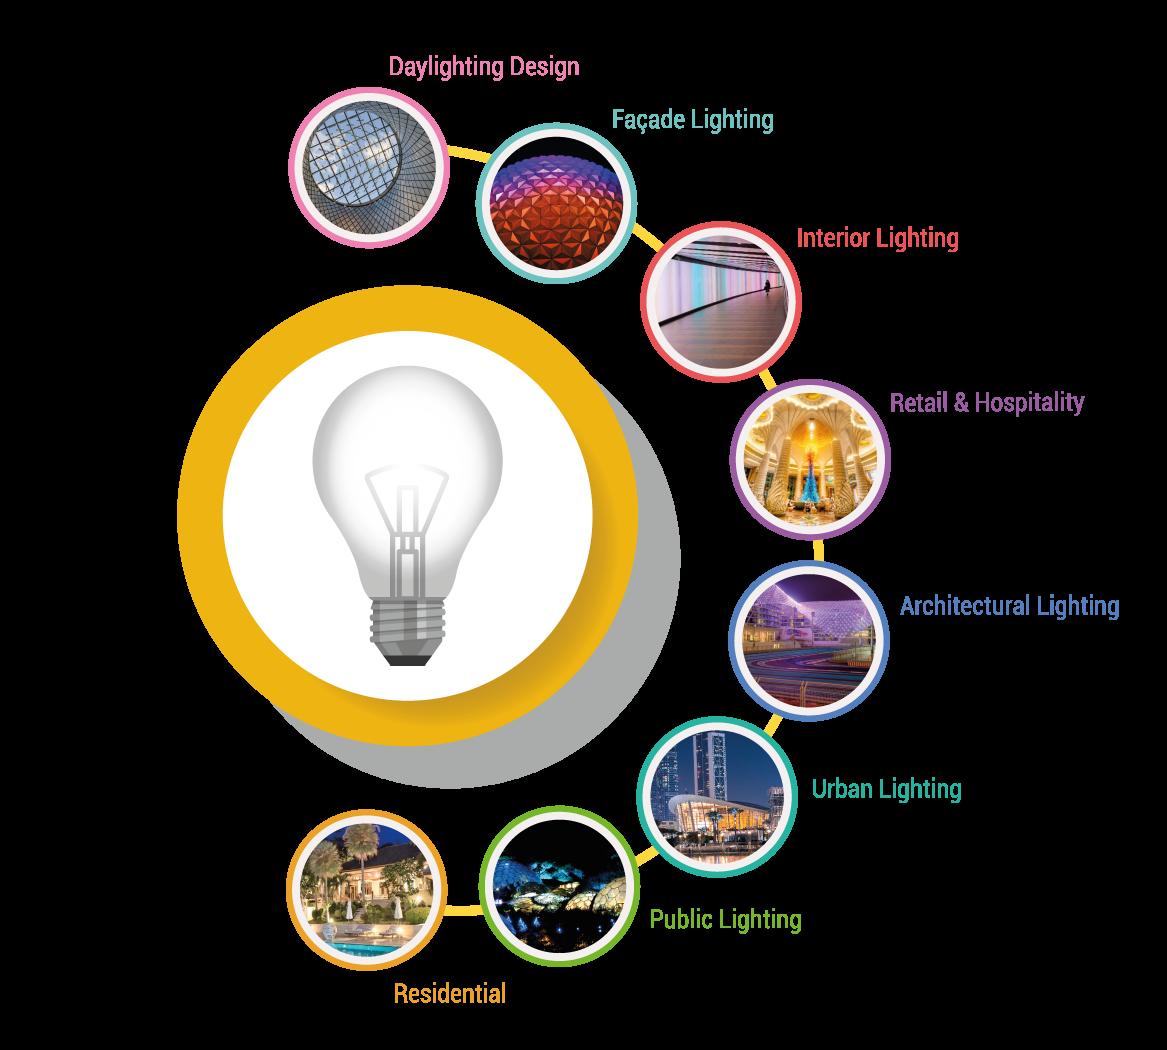 Middle East Lighting Design Summit | 29 - 30 April 2019 | Dubai